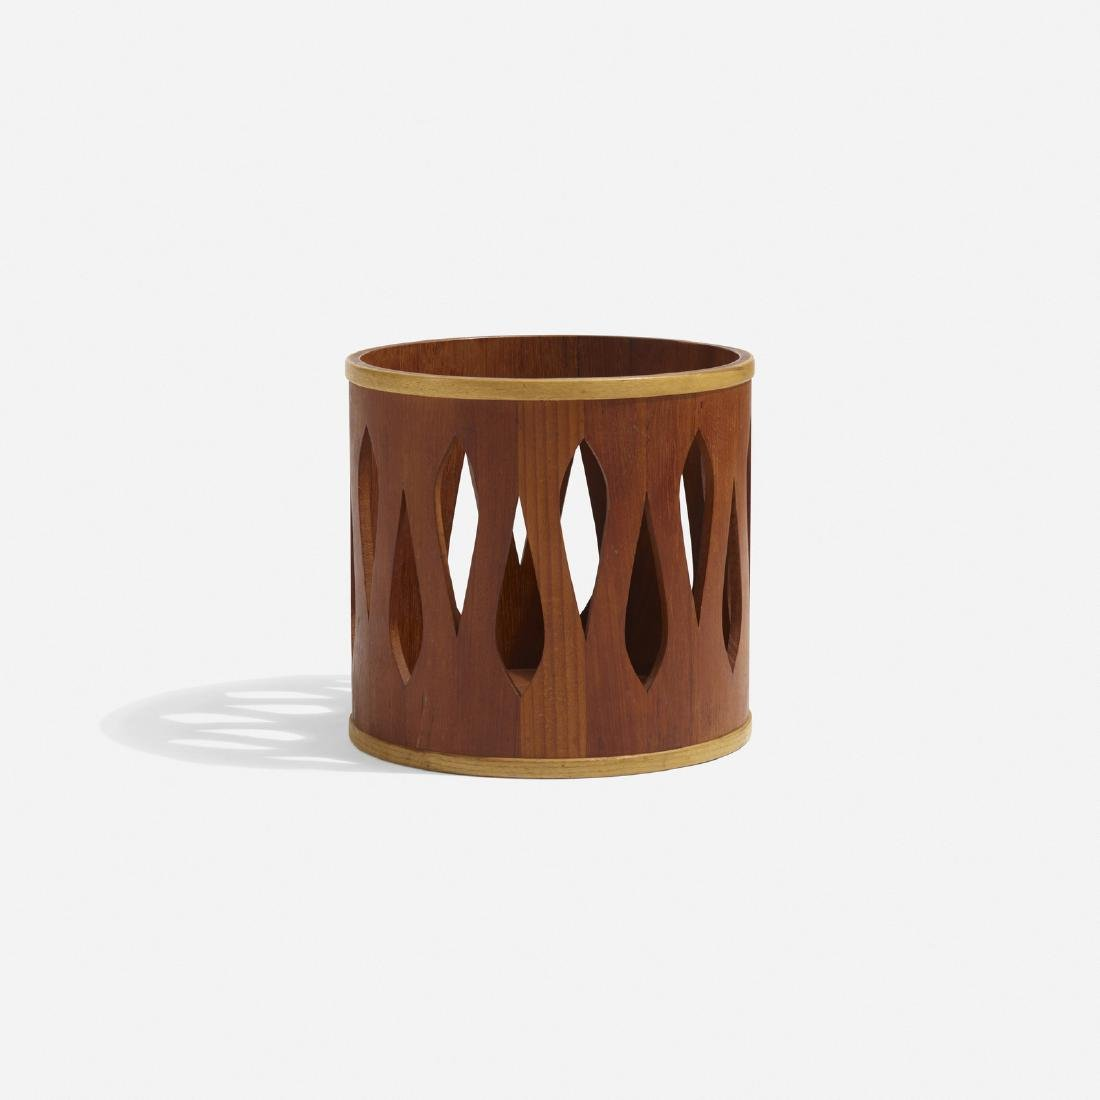 Jens Quistgaard, wastepaper basket